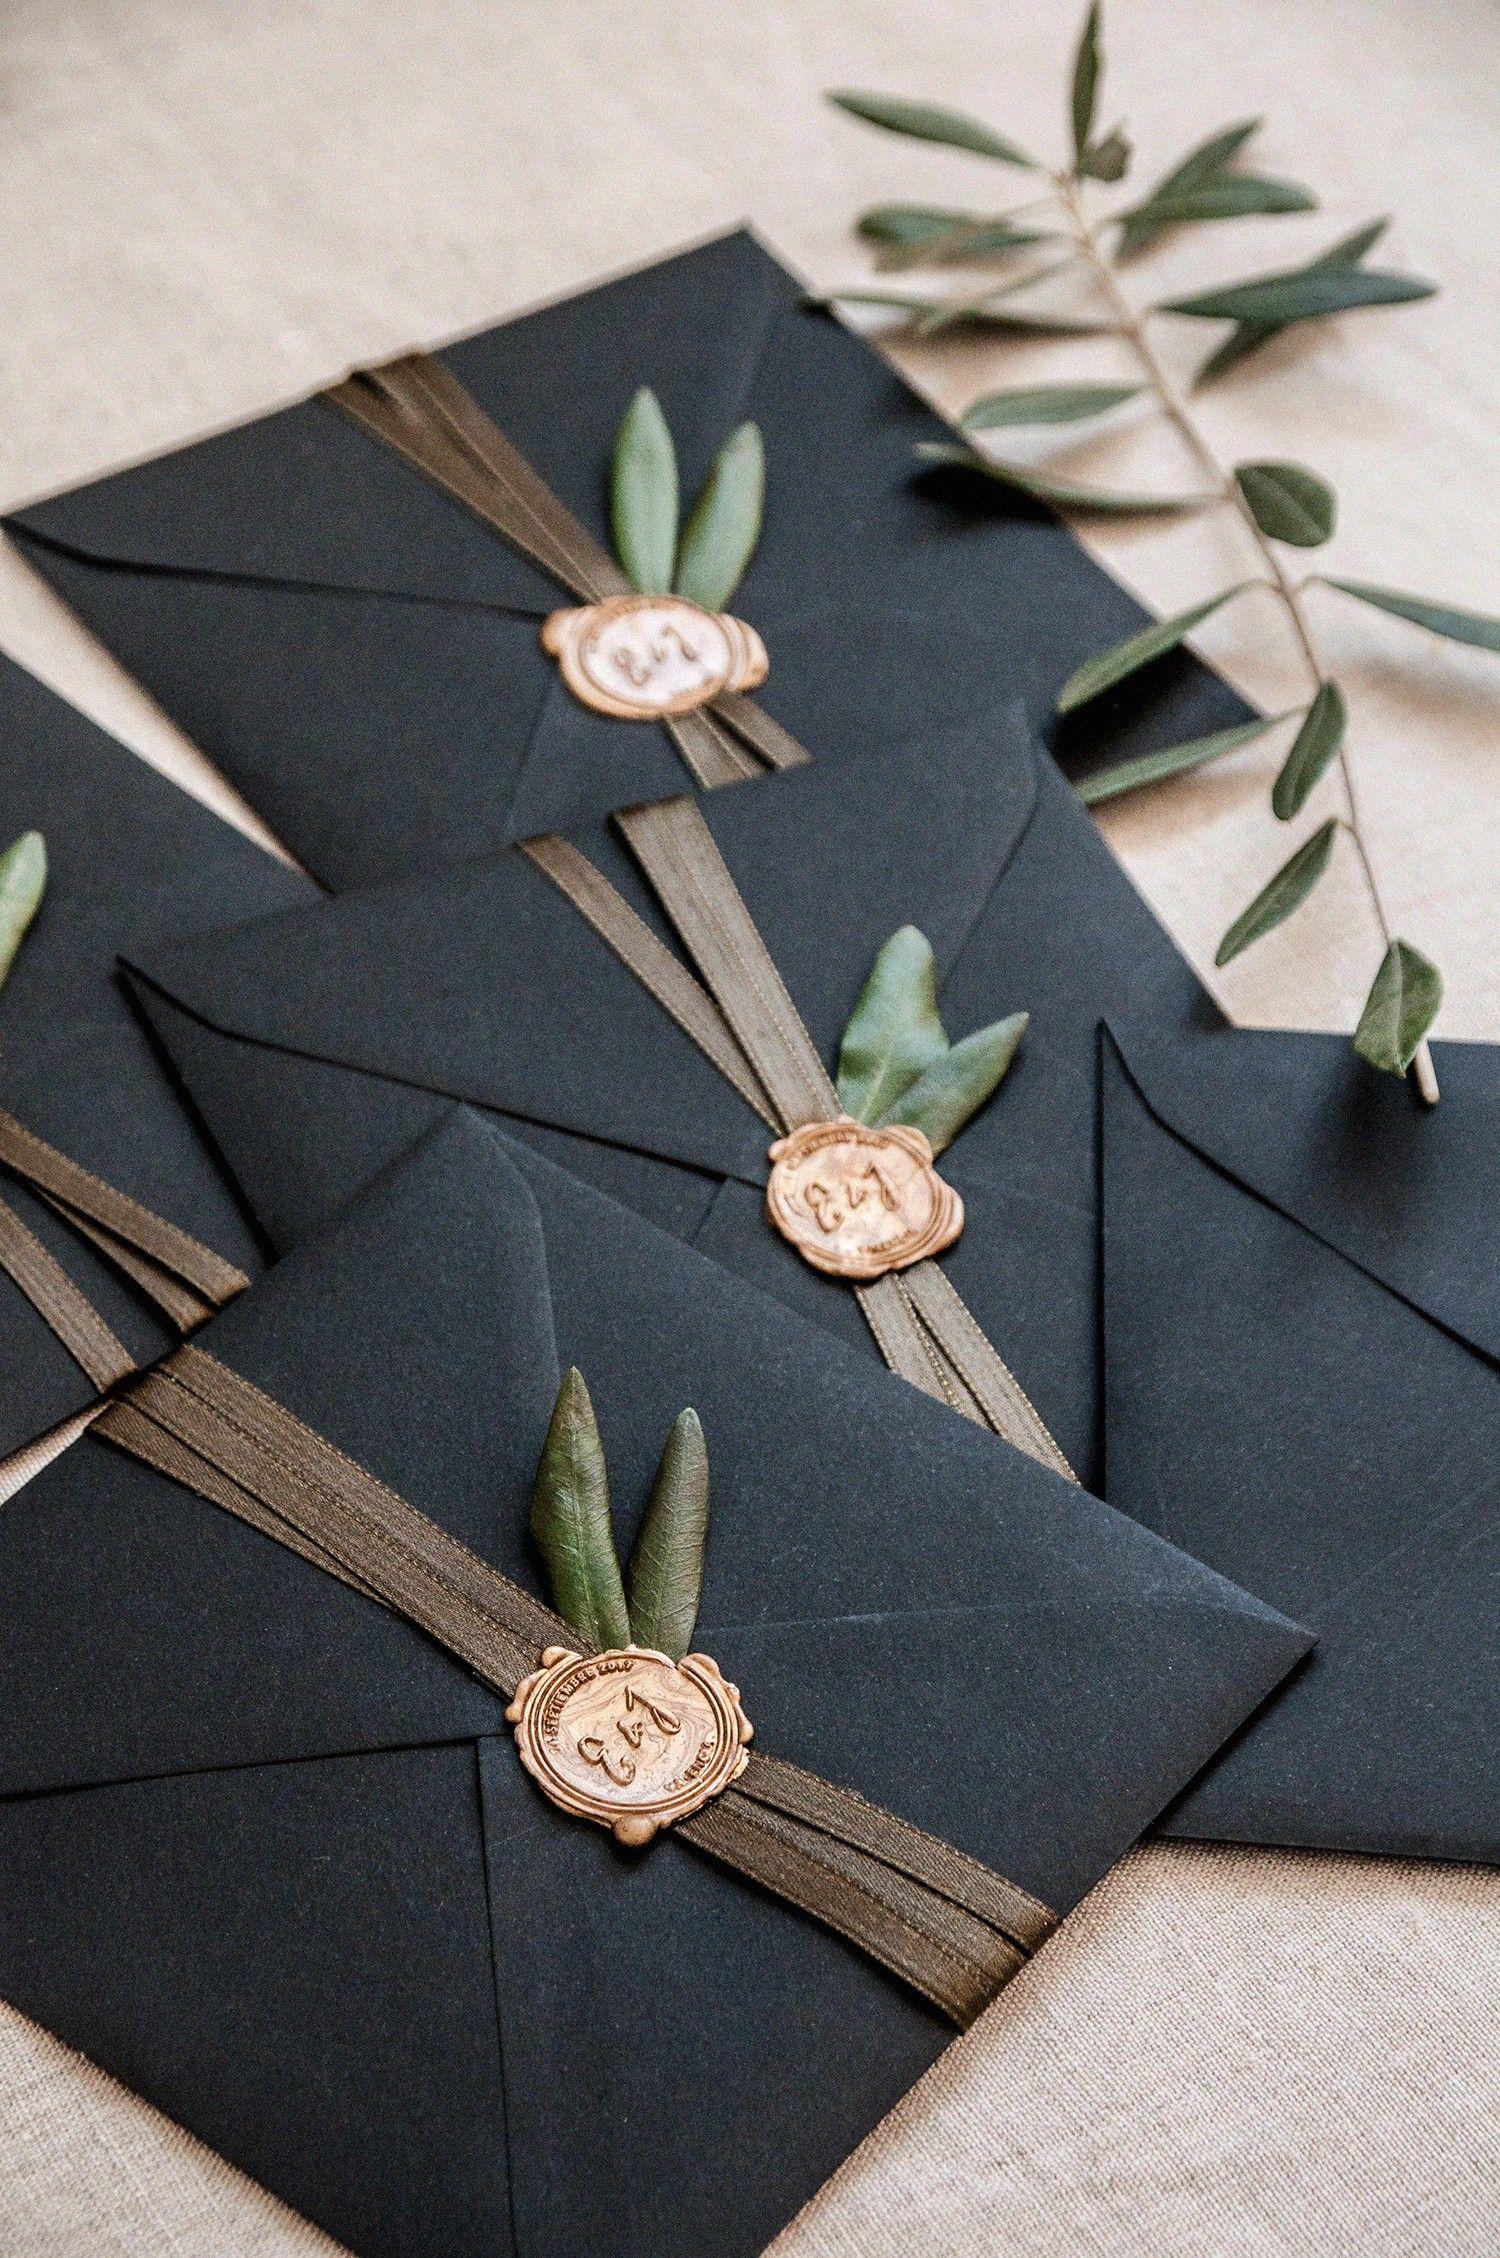 E+J INVITATIONS en 2020 | Invitaciones de boda, Tarjeta de invitacion boda,  Tarjetas de boda elegantes